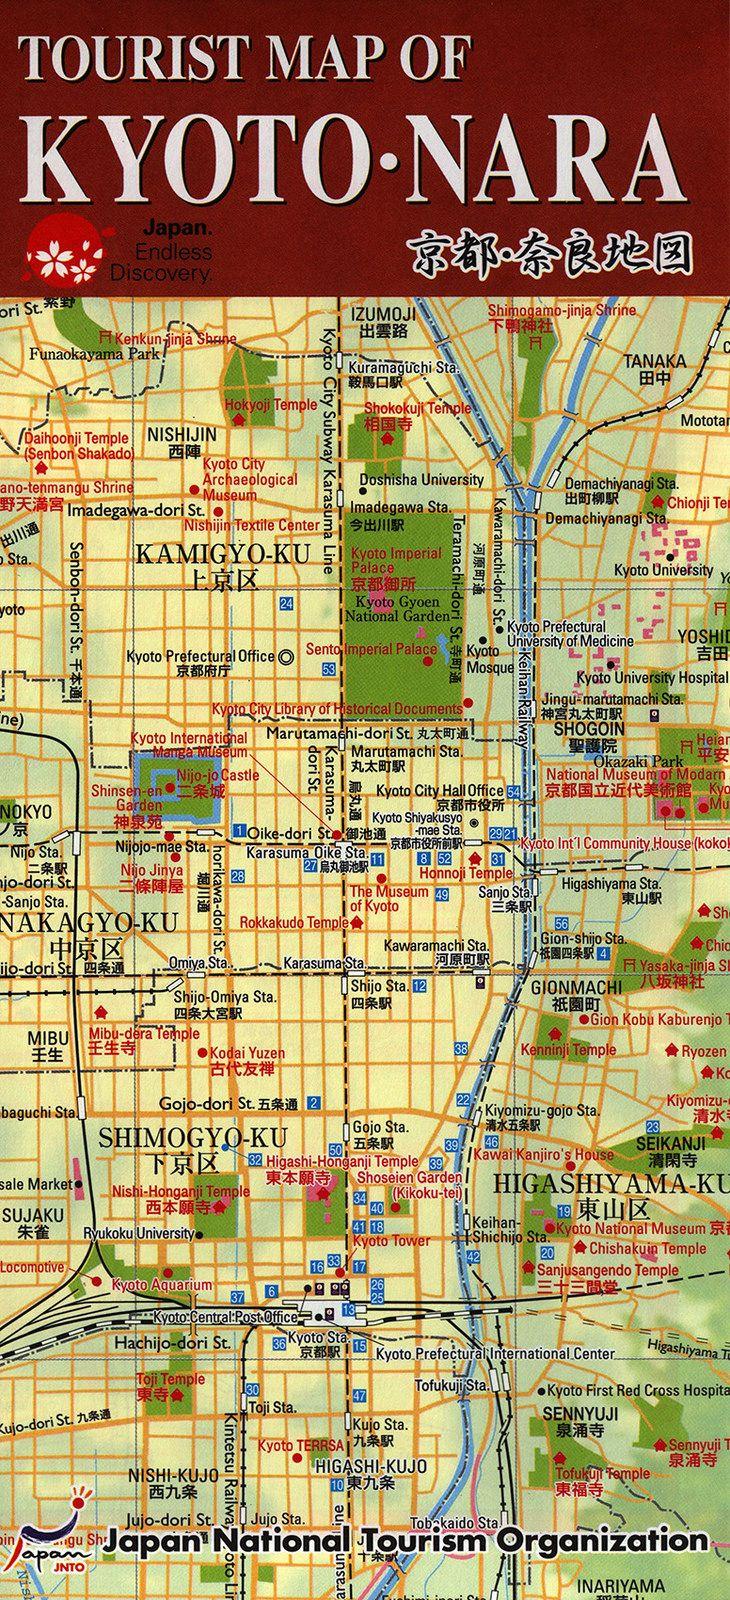 https://flic.kr/p/FyHobn | Tourist Map of Kyoto, Nara; 2015_1, Japan | tourism travel brochure | by worldtravellib World Travel library